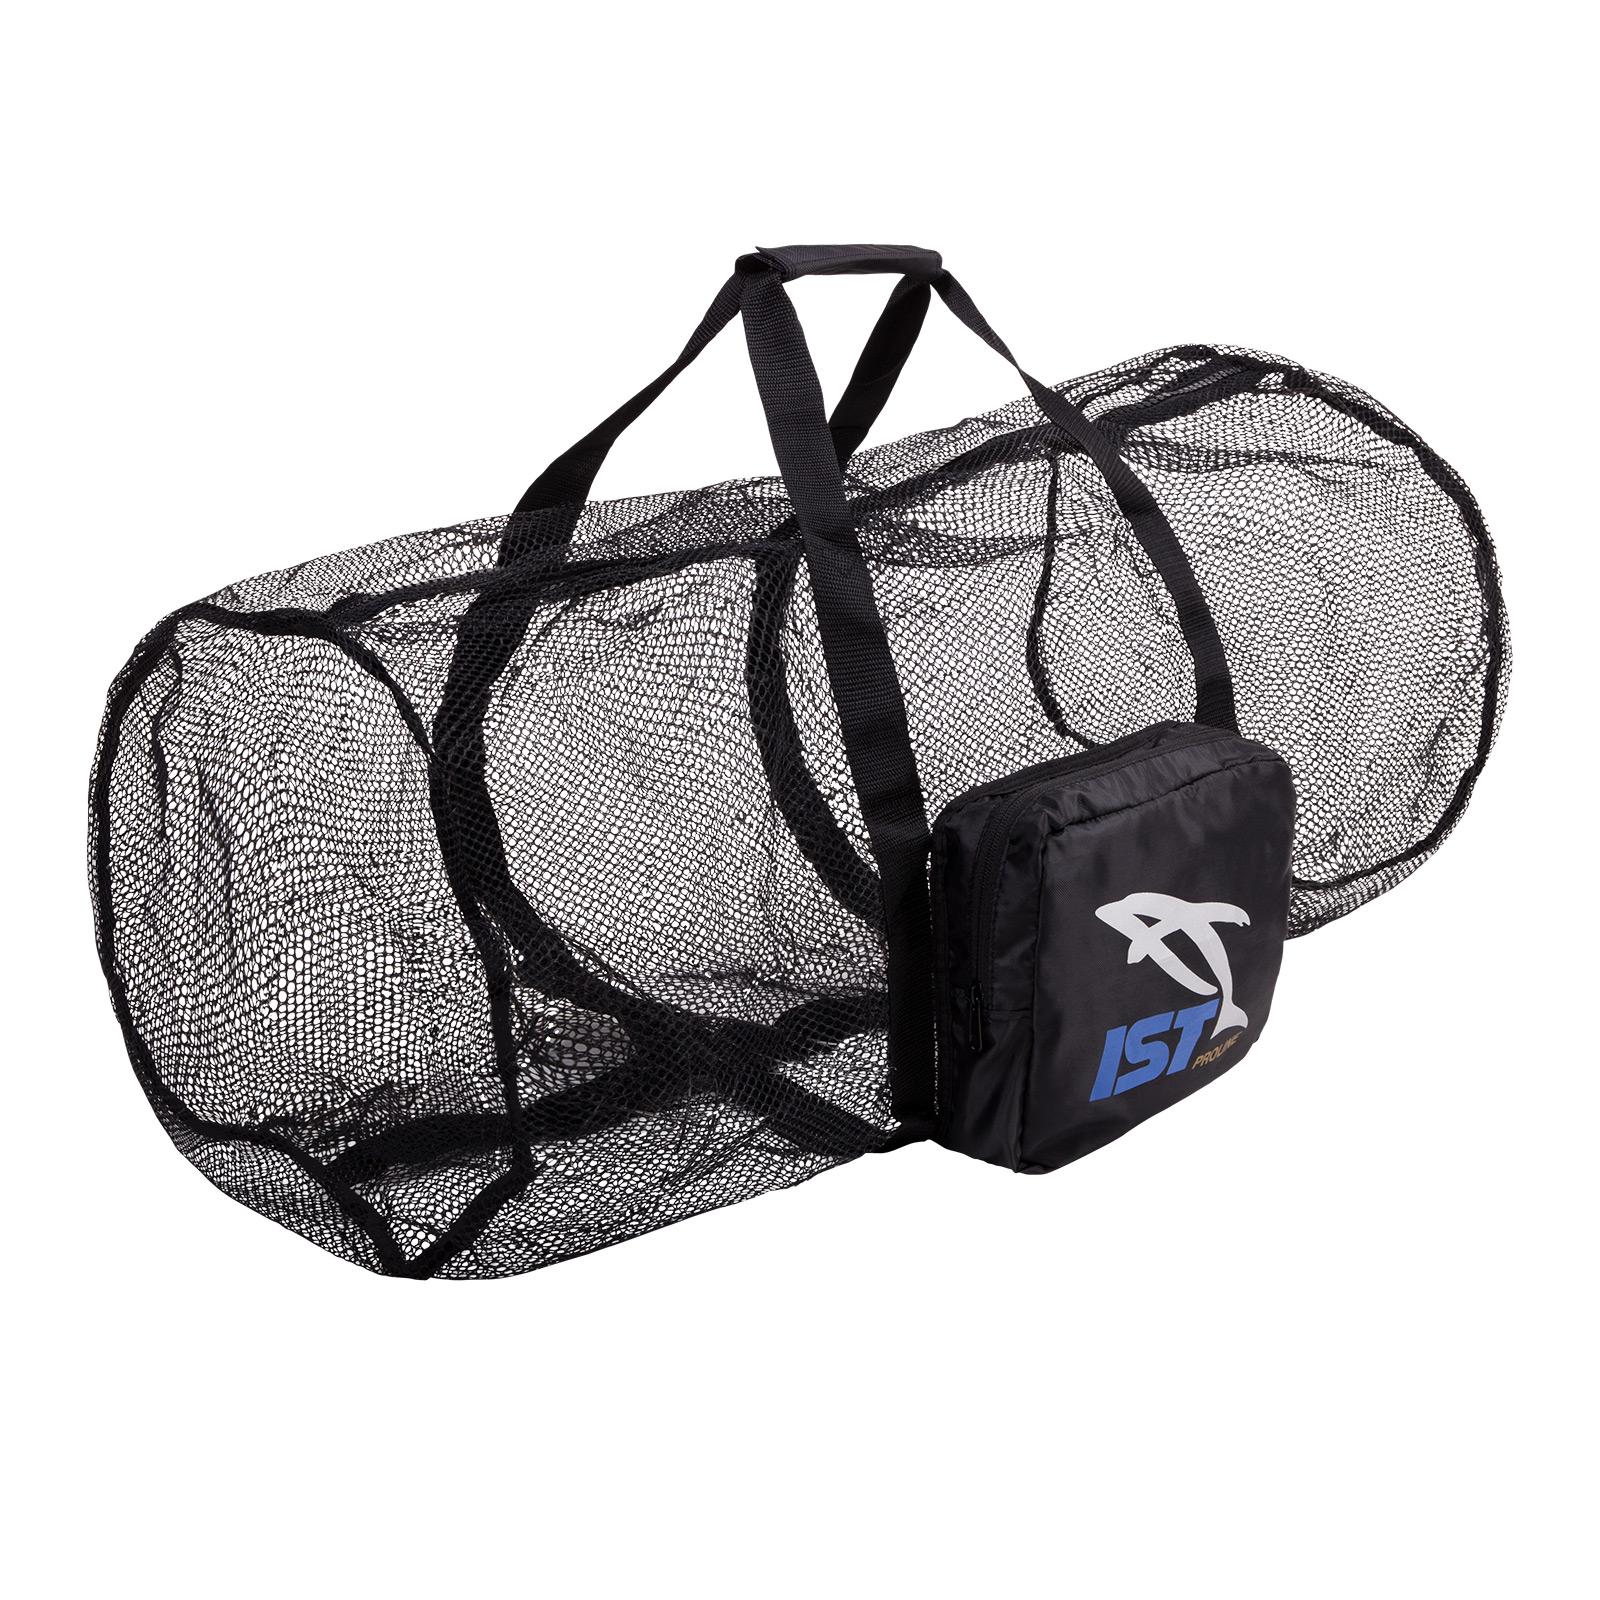 Folding Mesh Bag